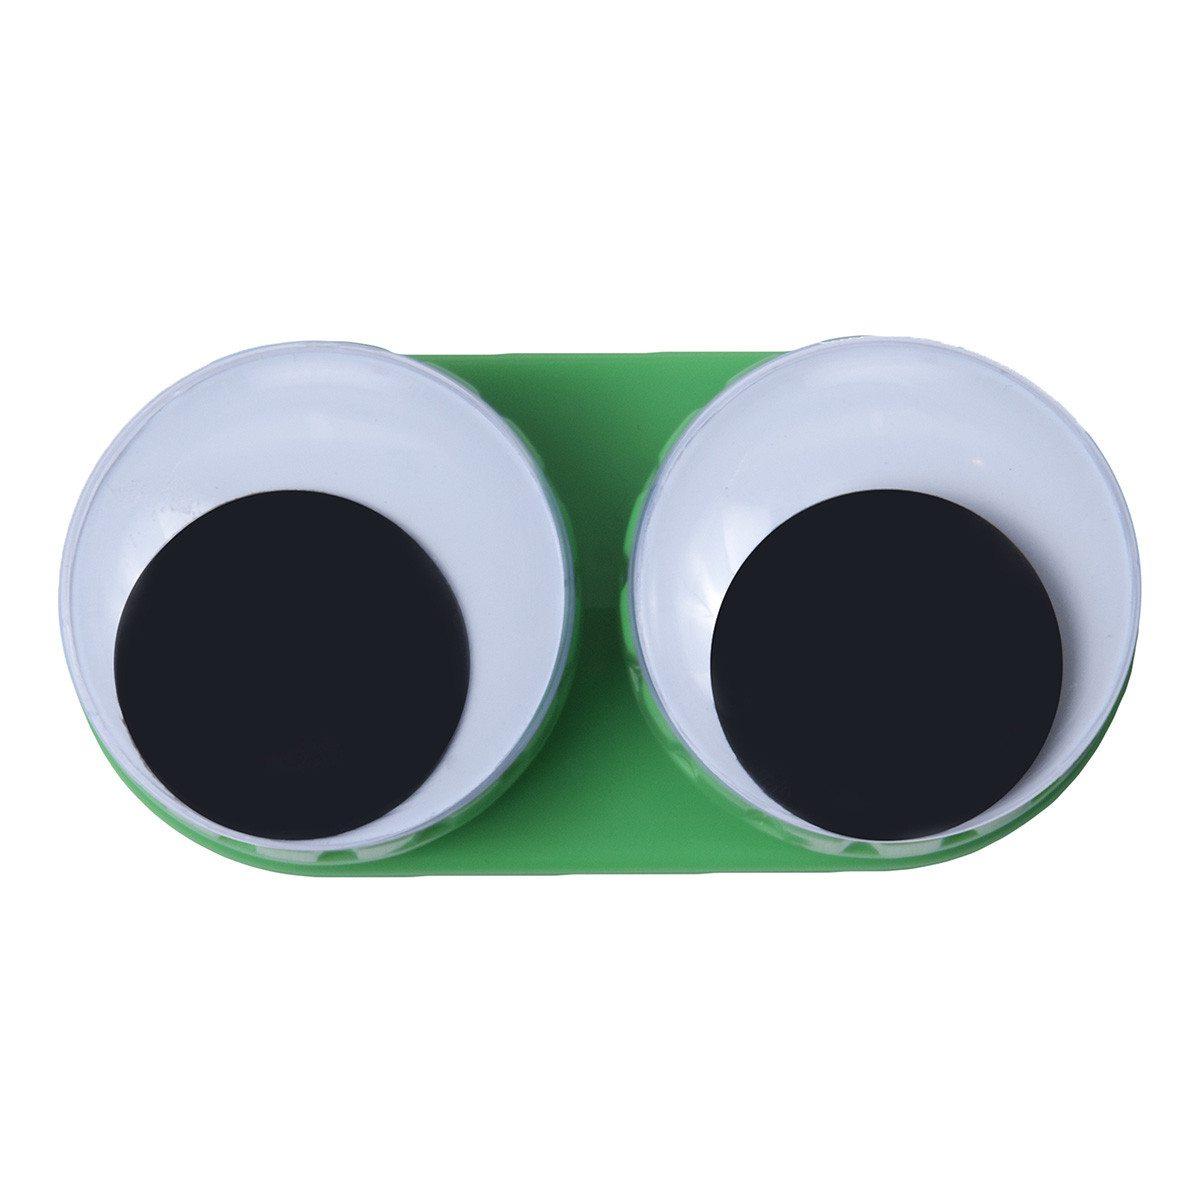 Google Eyes - Kontaktlinsenbehälter